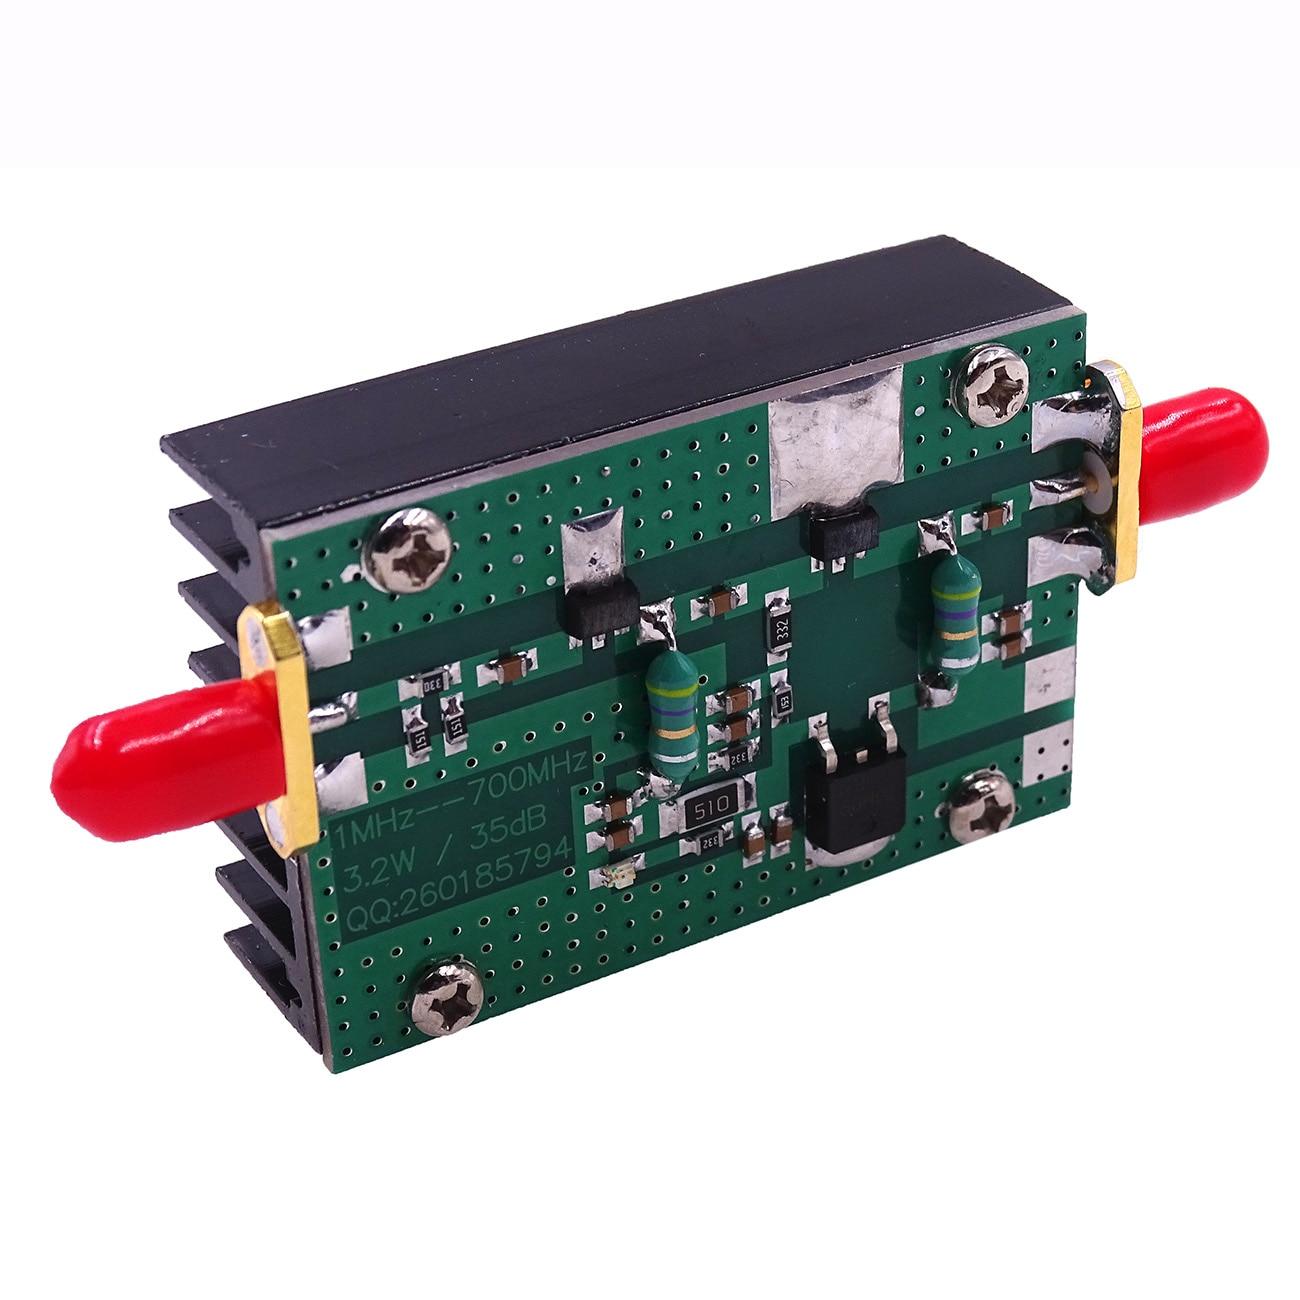 1mhz 1000mhz 35db 3w Hf Vhf Uhf Fm Transmitter Broadband Rf Power 70mhz Amplifier 1pcs New Arrival 700mhz 32w